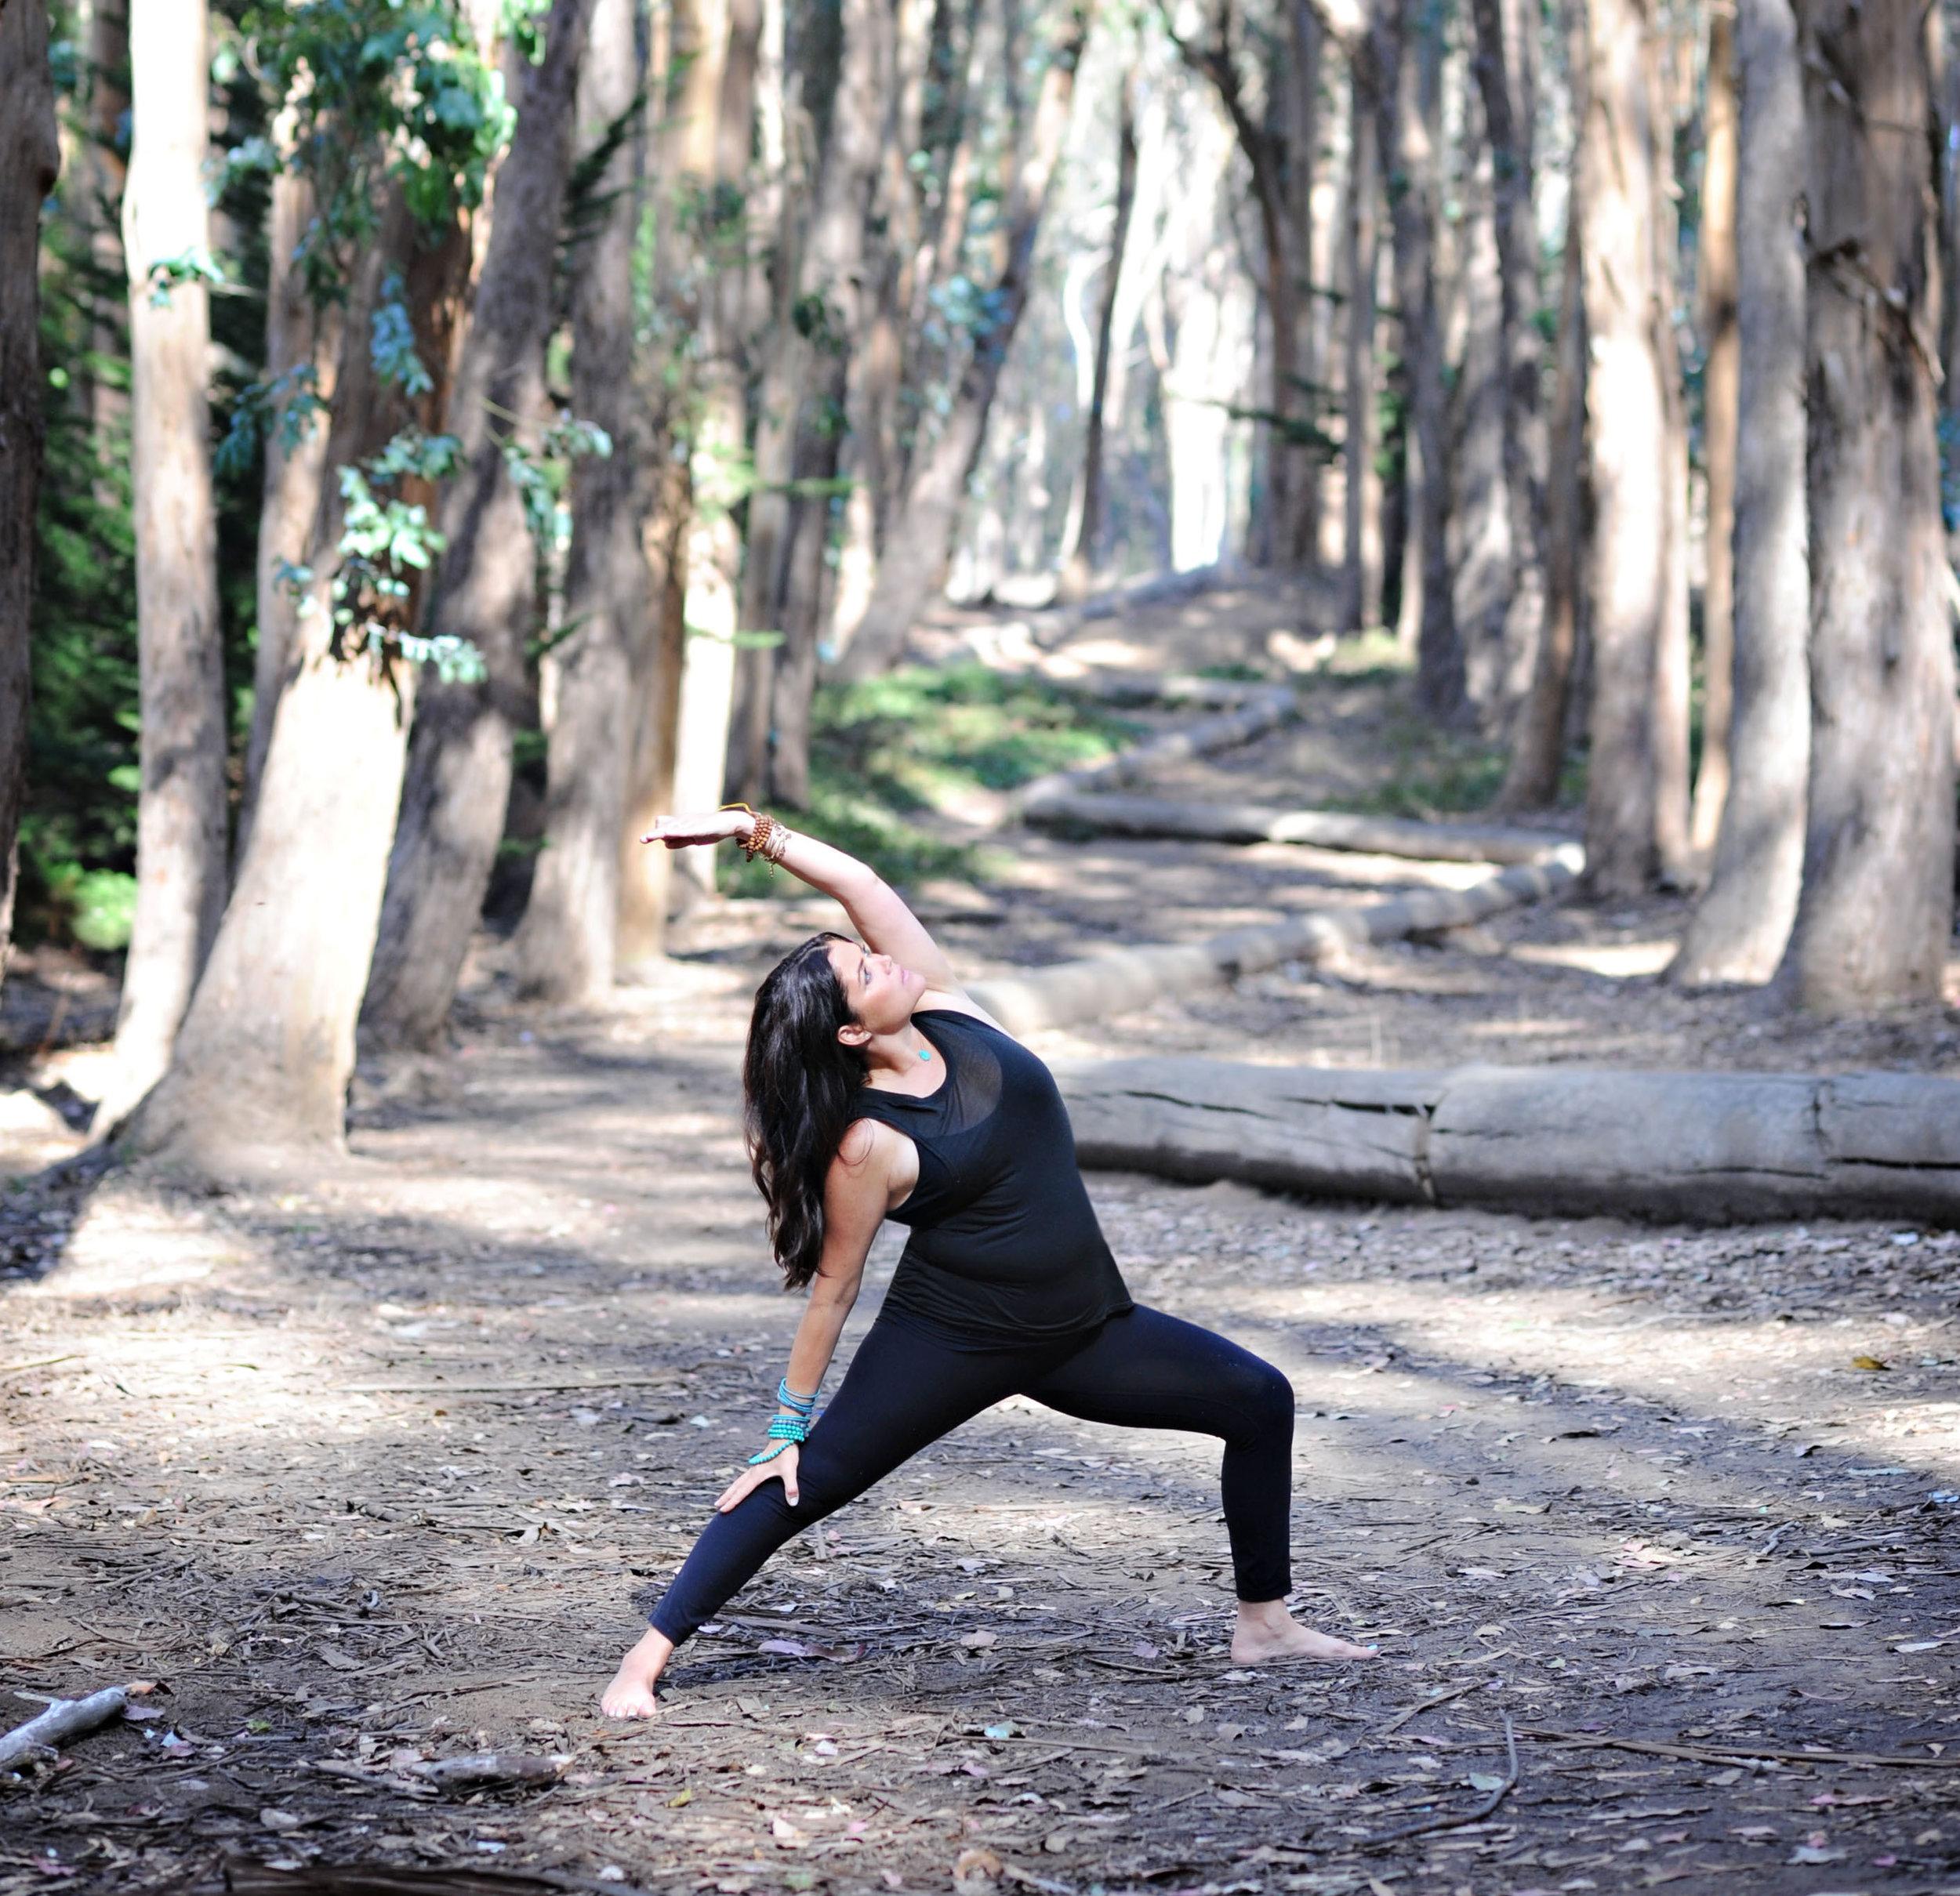 Bryant Resch, yoga instructor